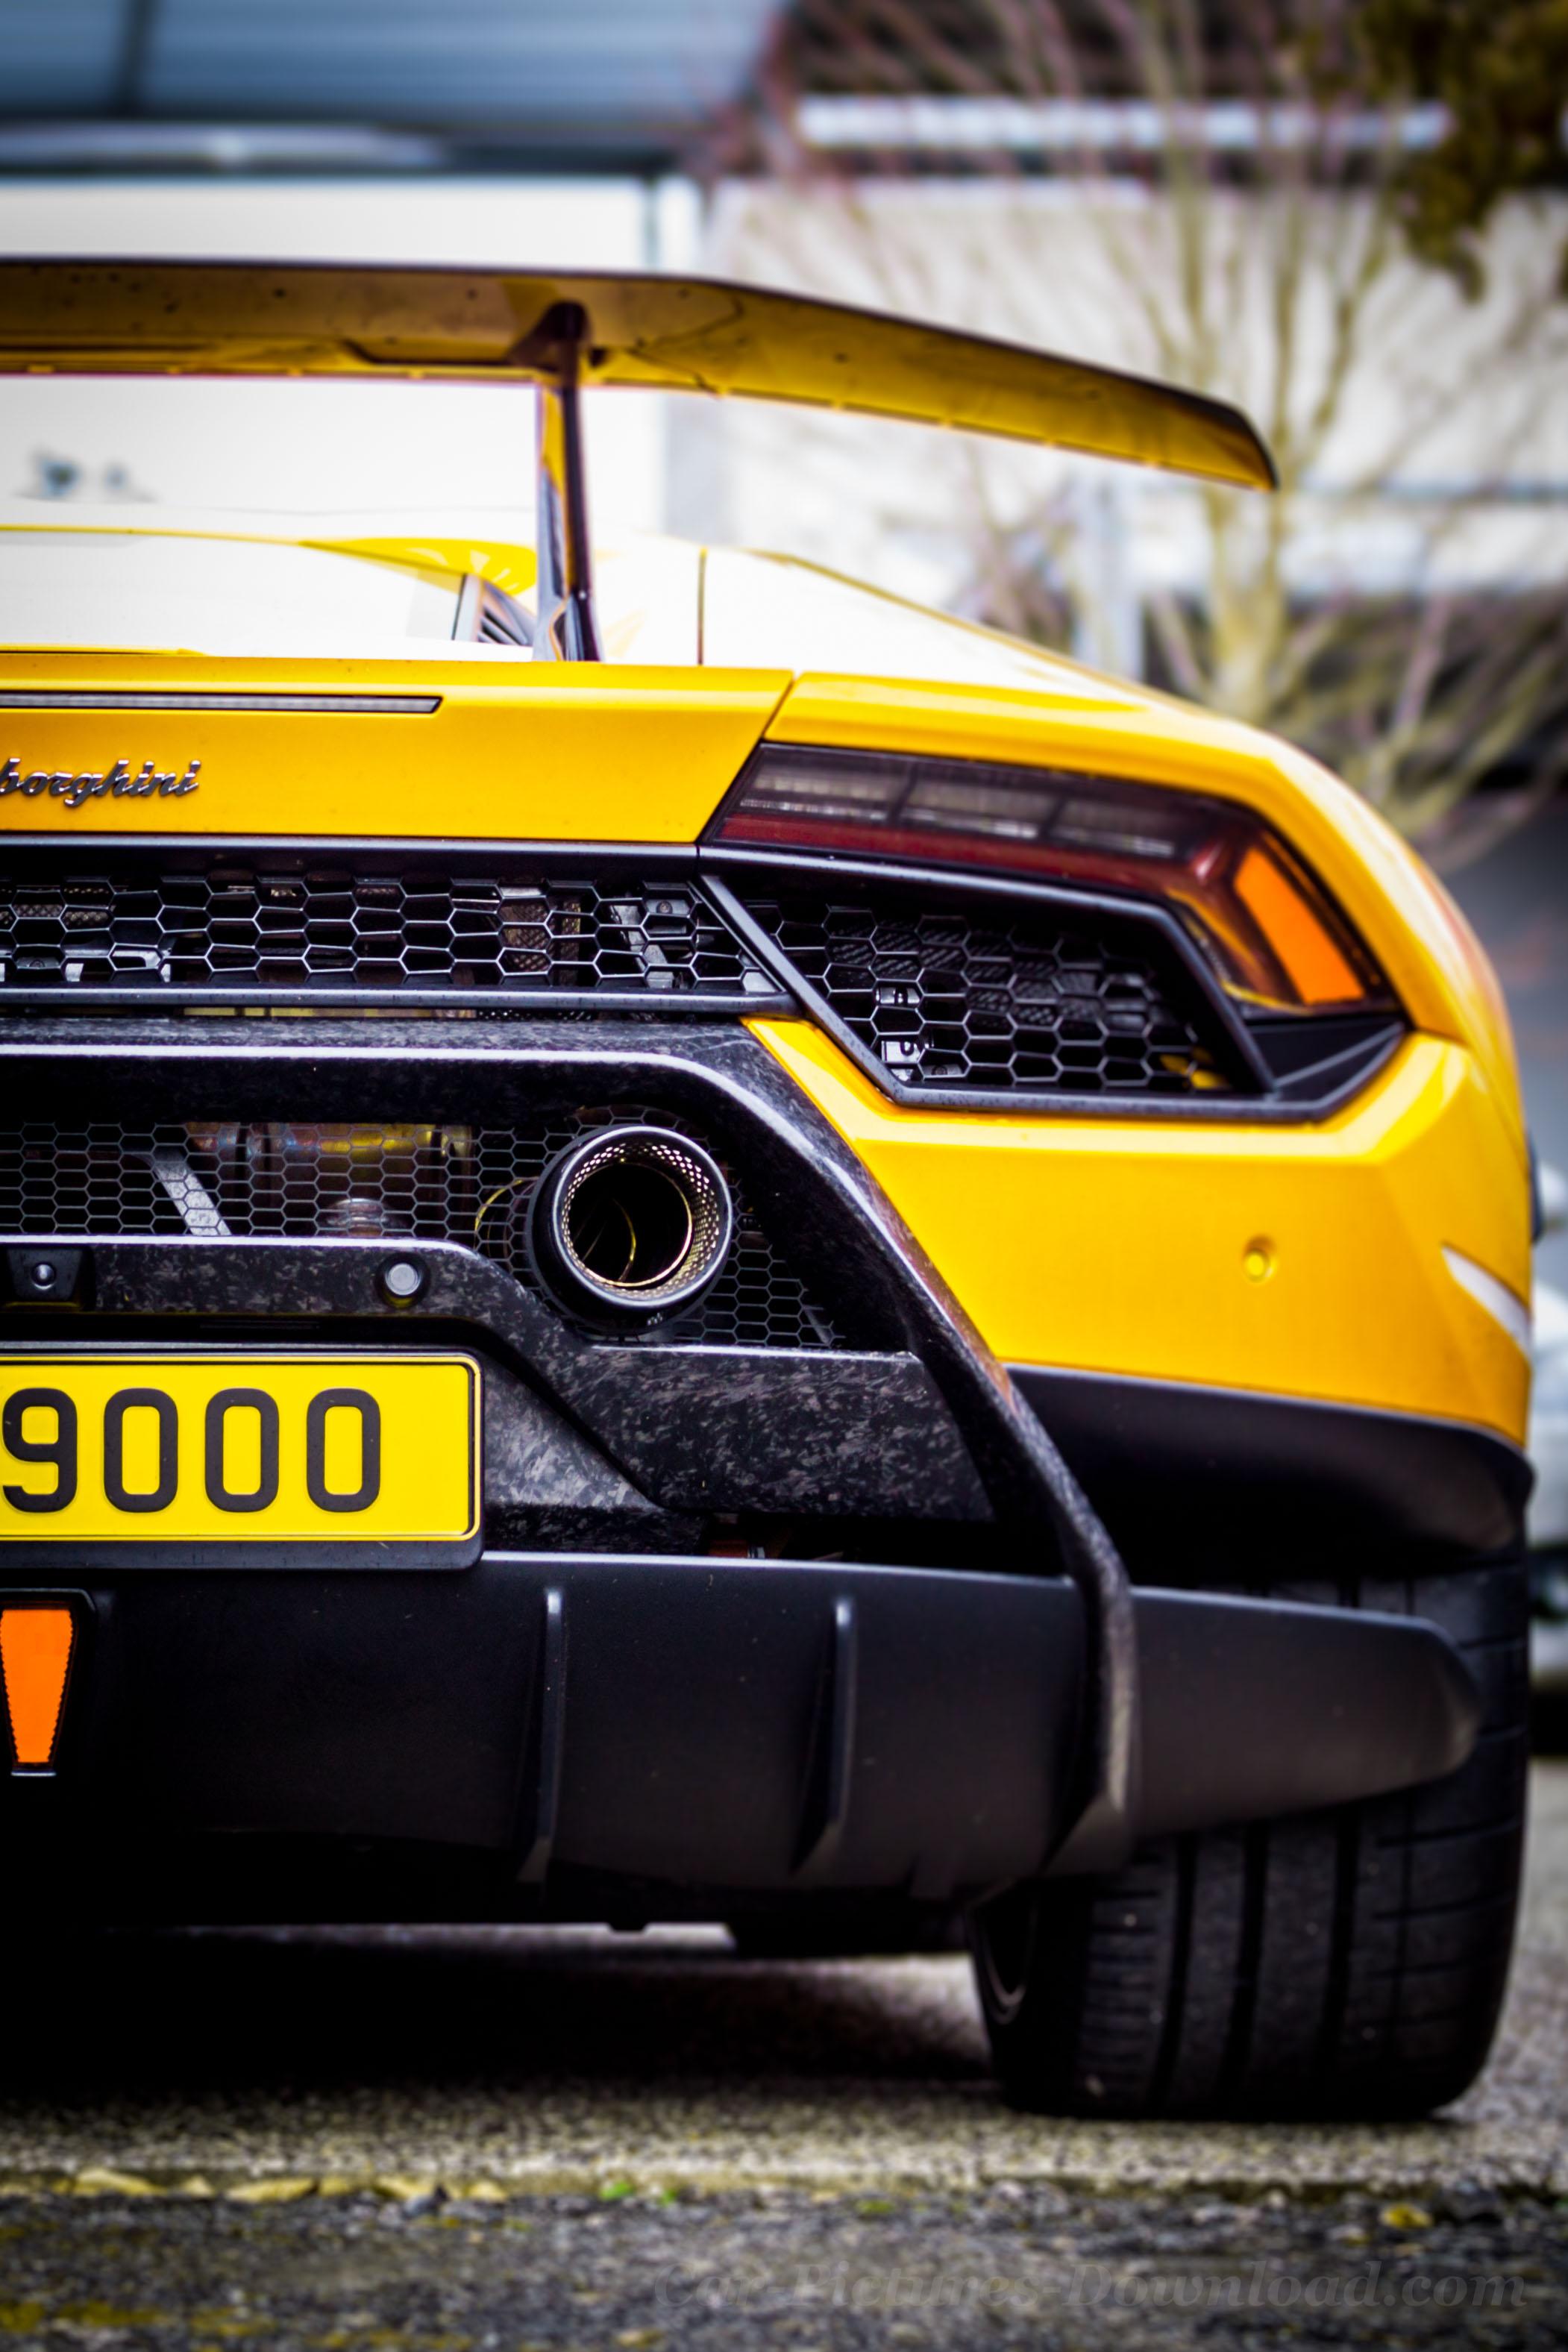 Lamborghini Huracan Wallpaper Pictures 4K Ultra HD Free